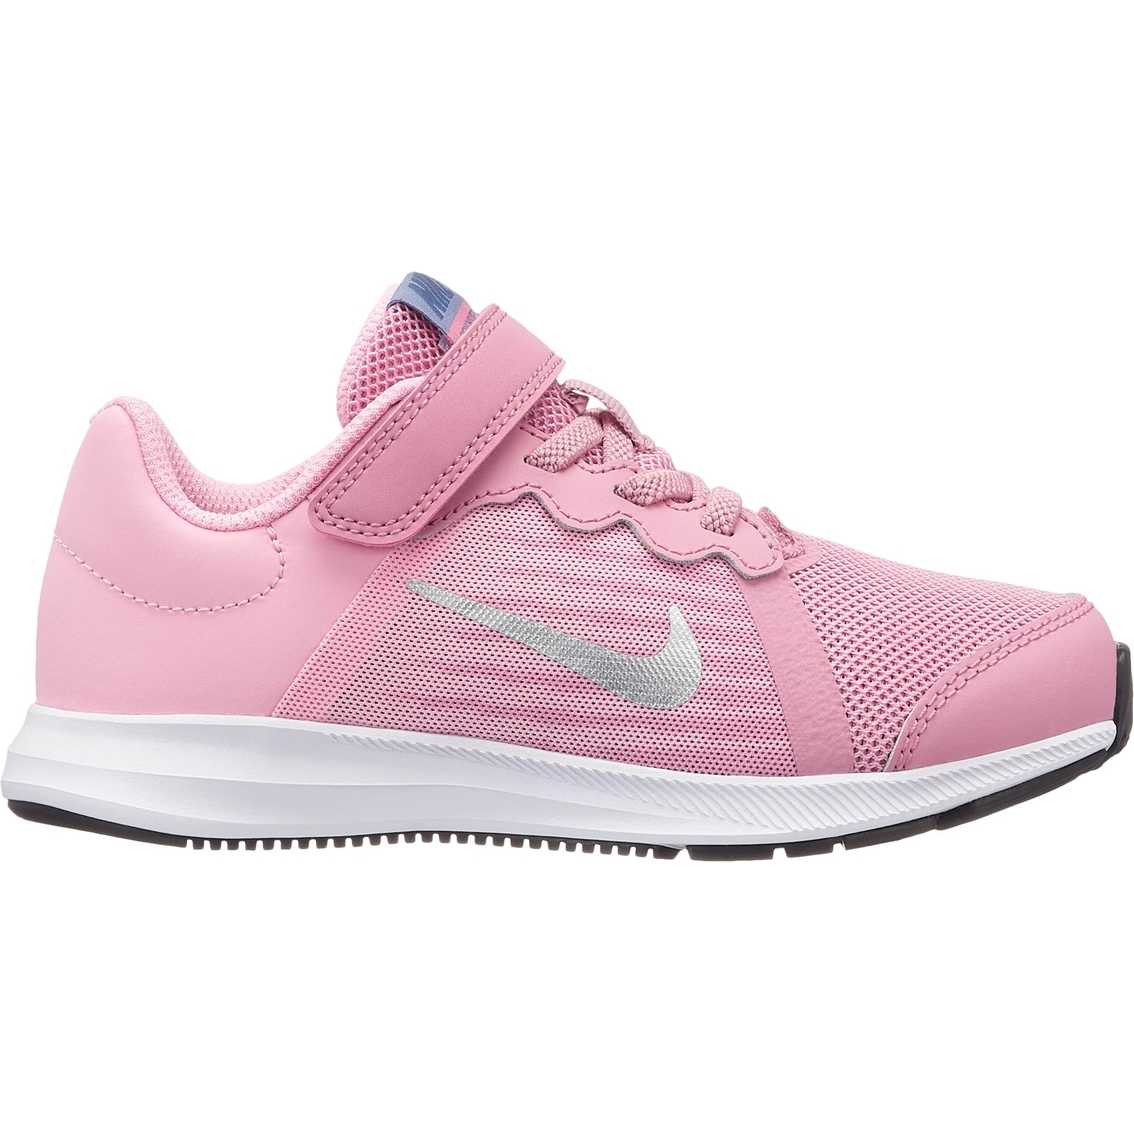 Nike Preschool Girls Downshifter 8 Running Shoes  c232ba6dd